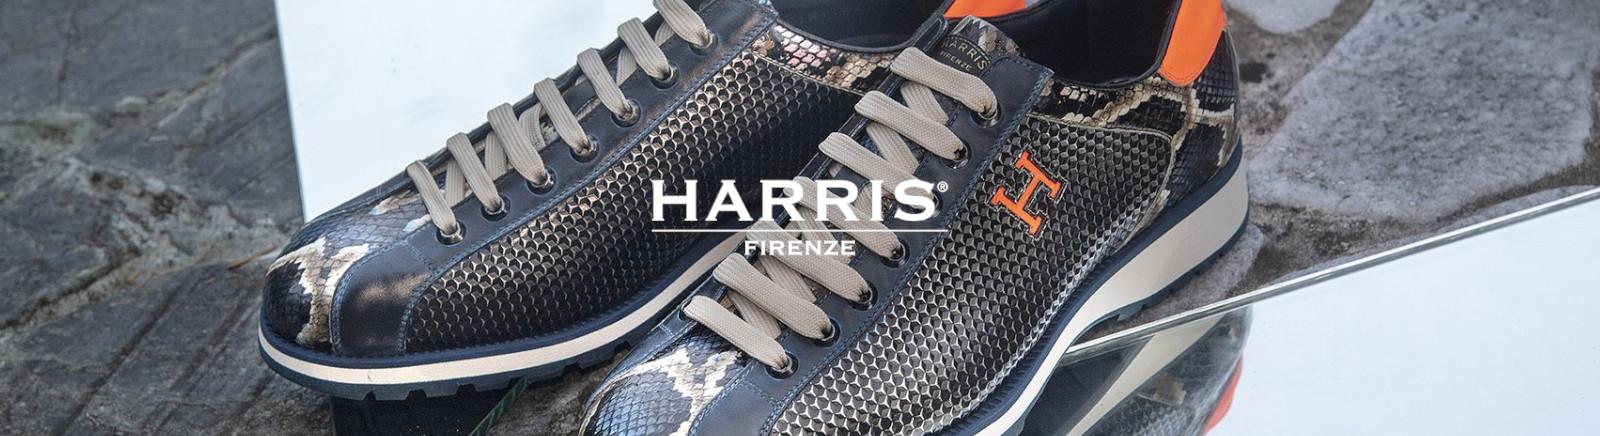 Juppen: Harris Slipper für Herren online shoppen